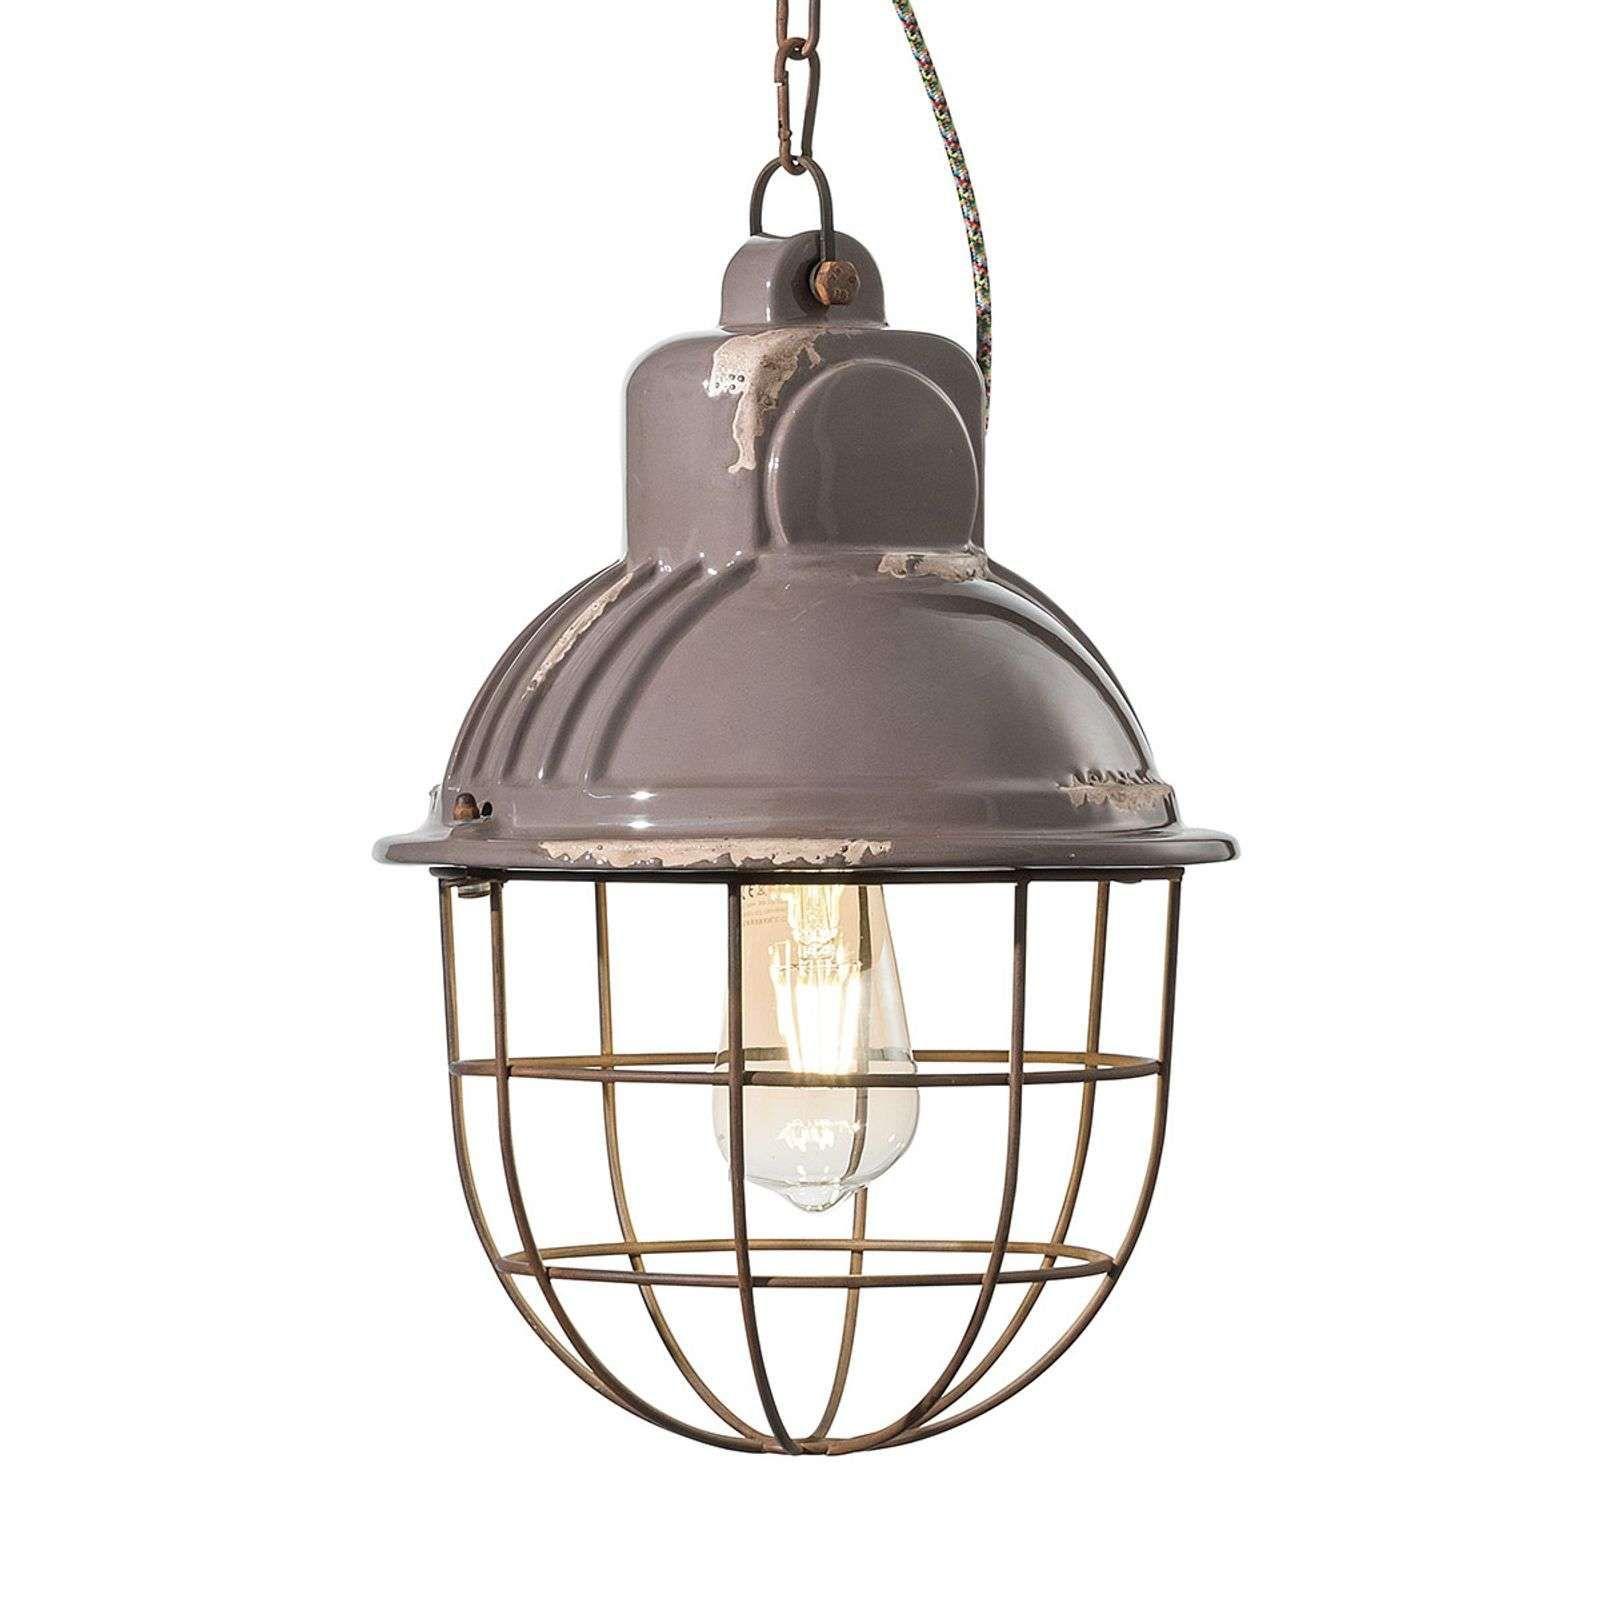 Suspension C1770 Au Design Industriel Bleu Gris In 2020 Moderne Lampen Hanglamp Hangende Lichten